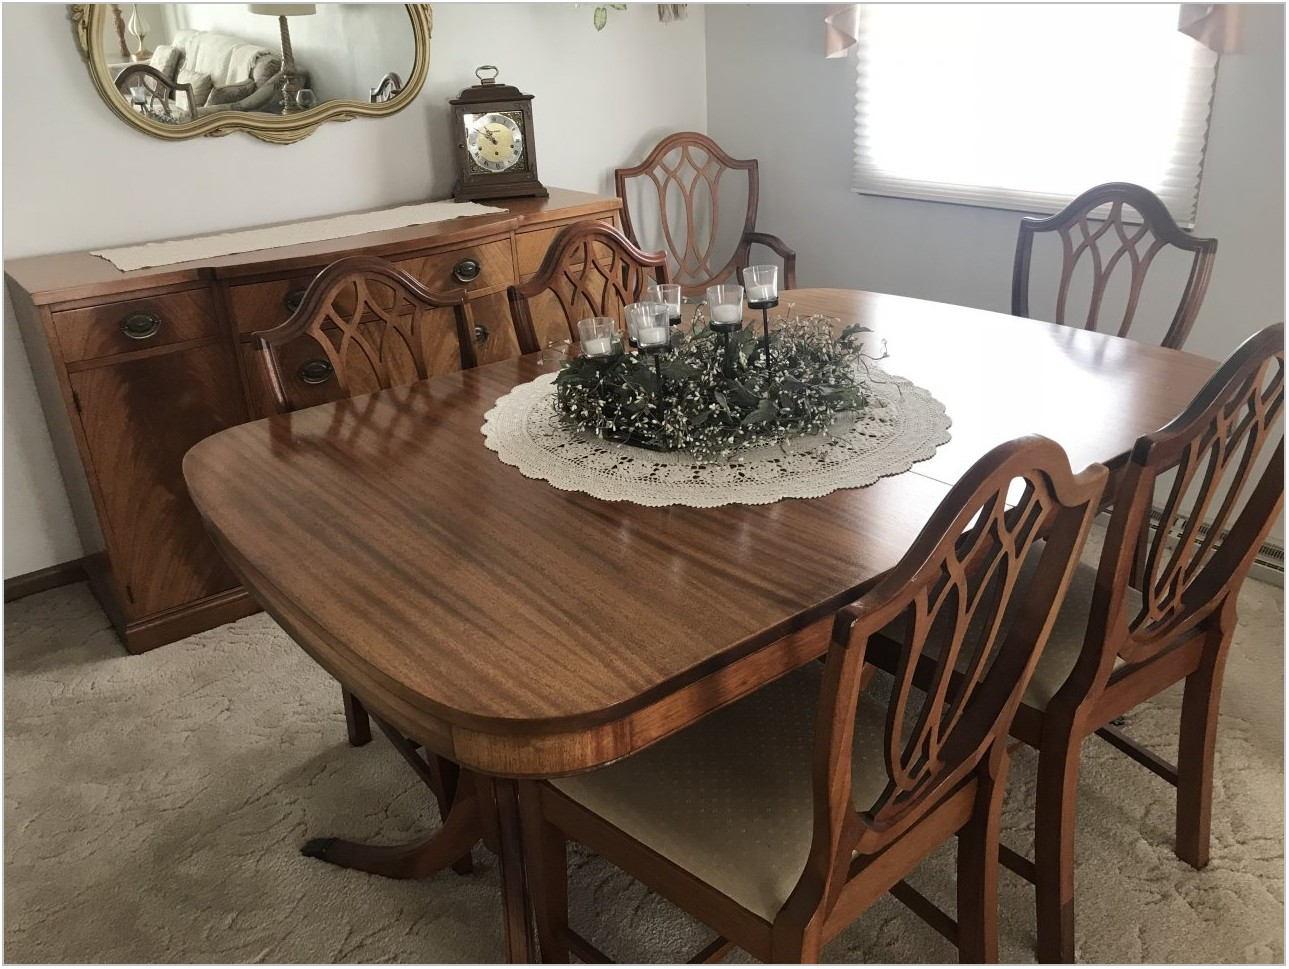 Rockford Furniture Company Dining Room Set Value